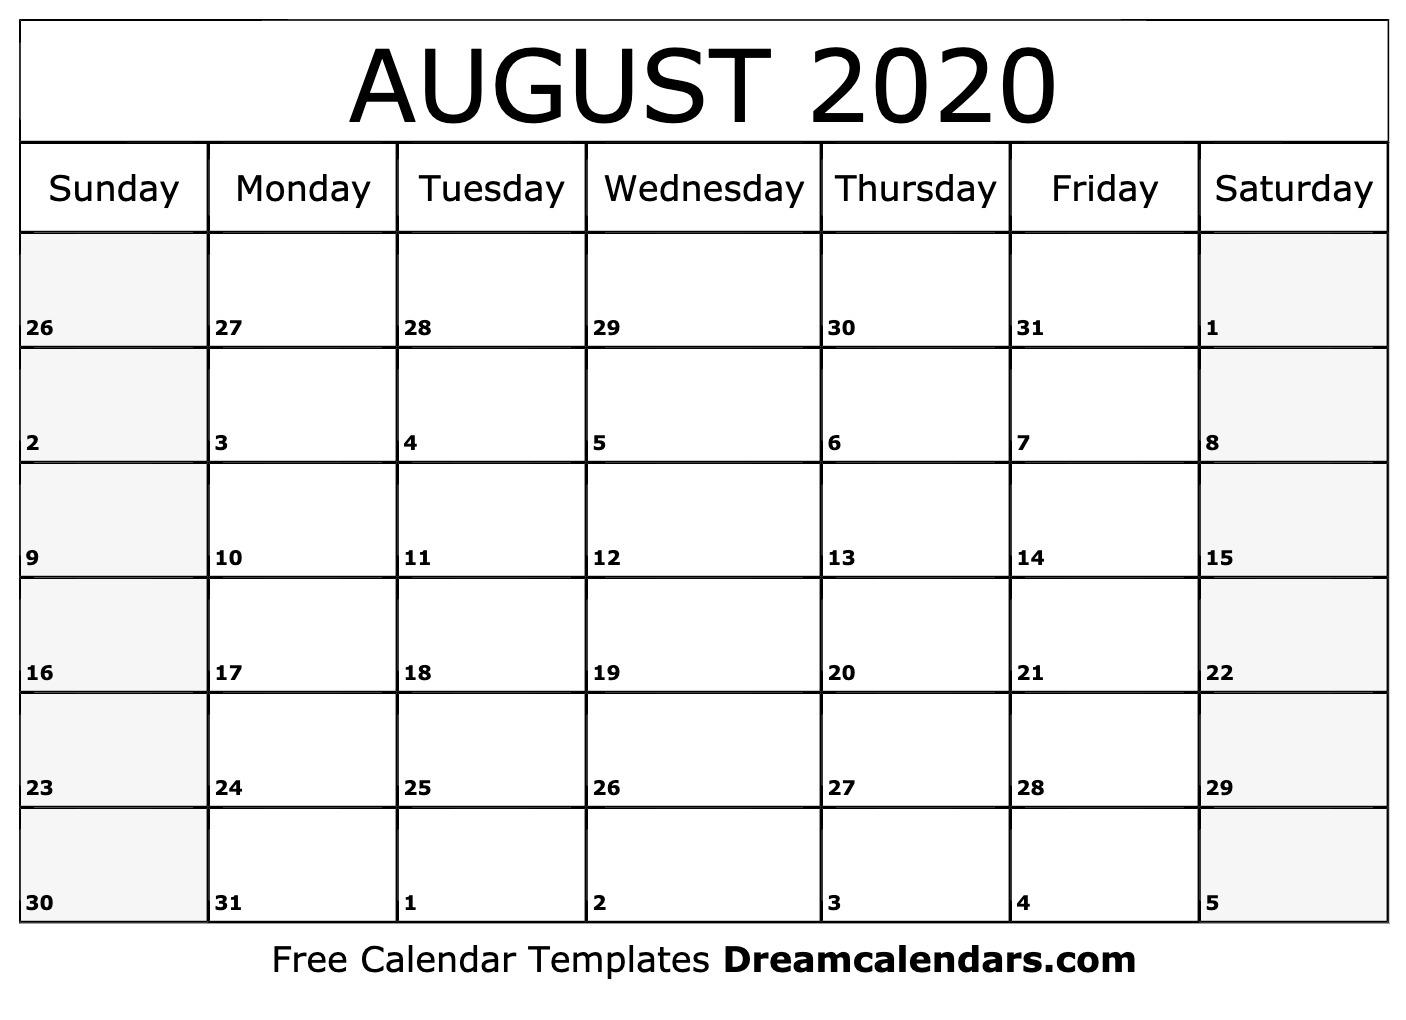 Print A Calendar August 2020 - Wpa.wpart.co